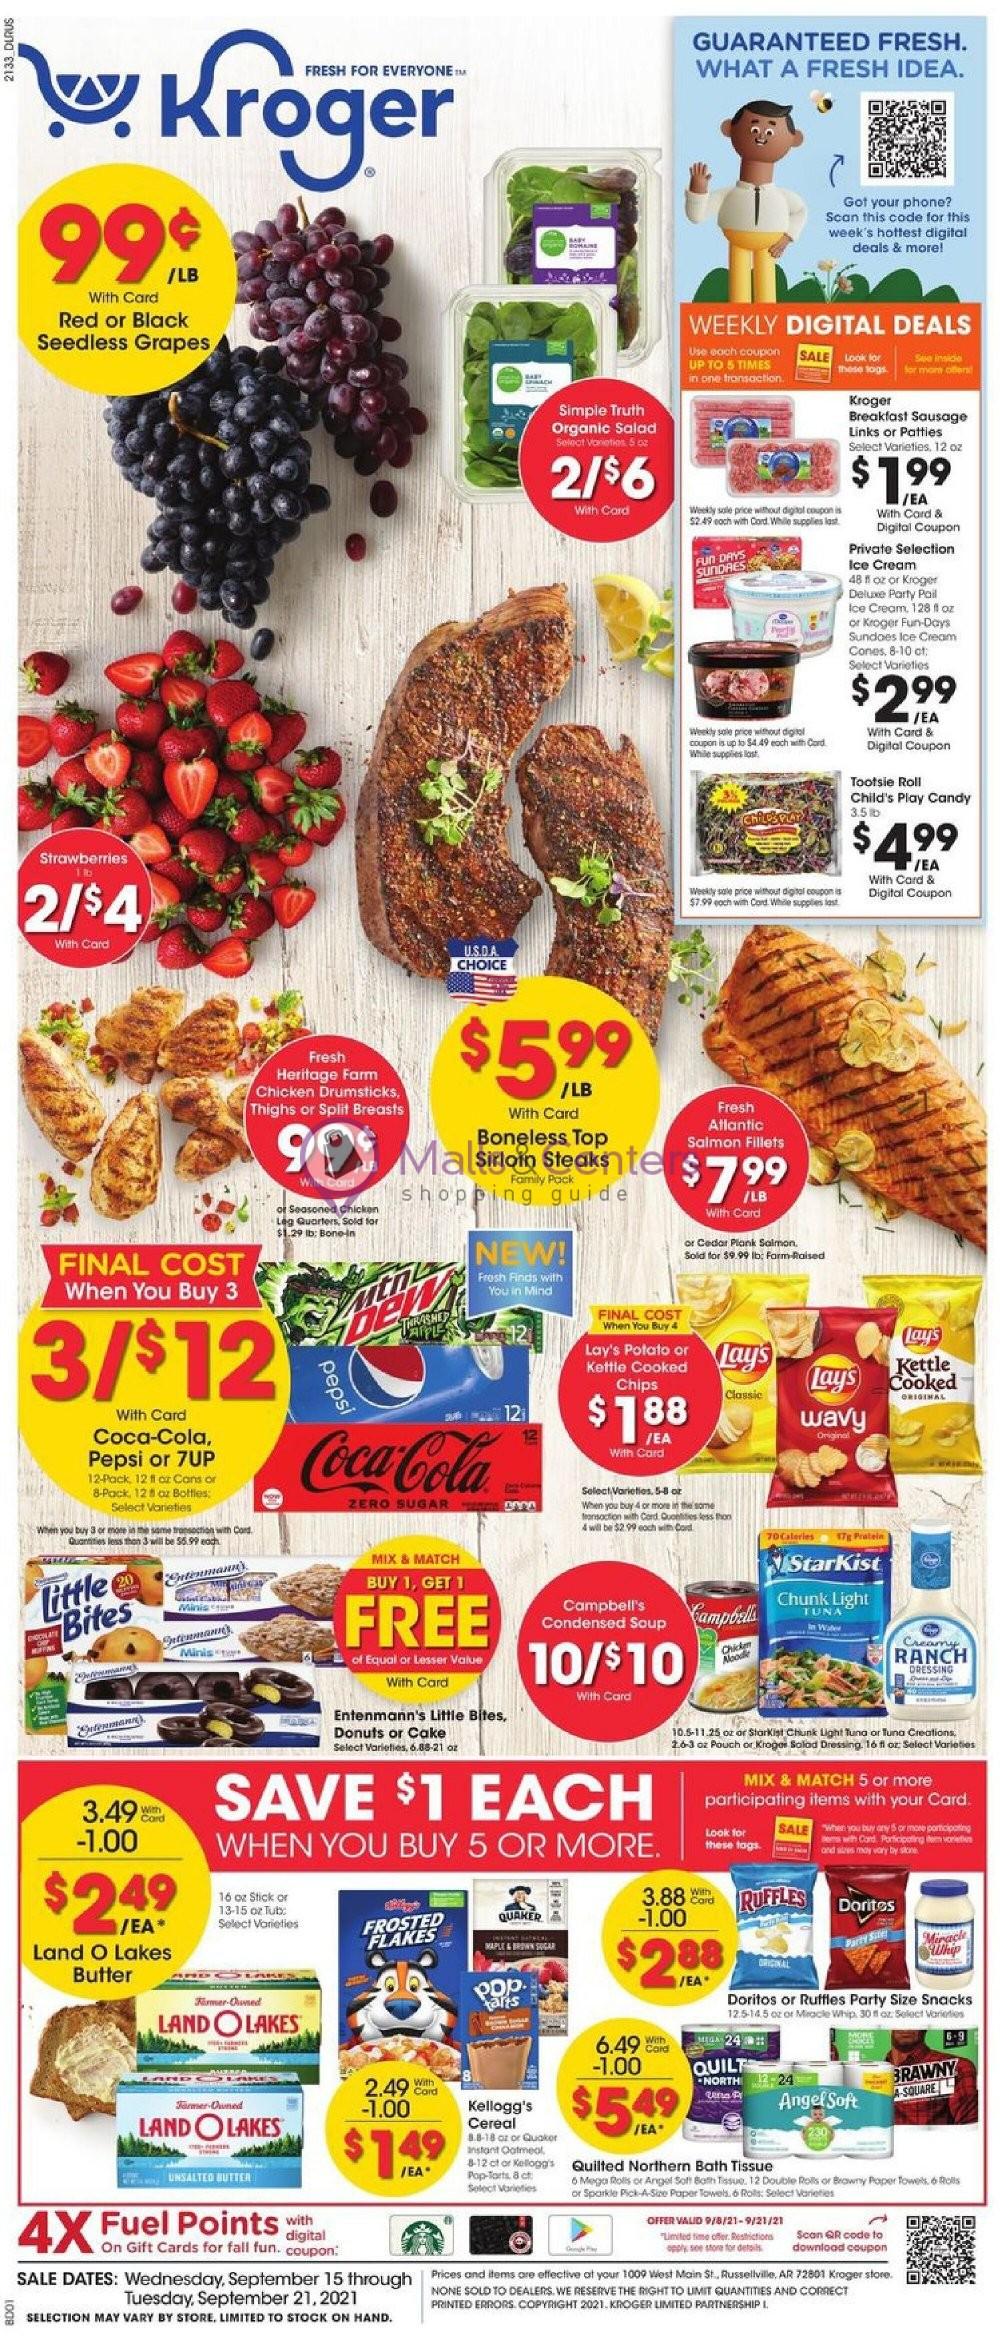 weekly ads Kroger - page 1 - mallscenters.com